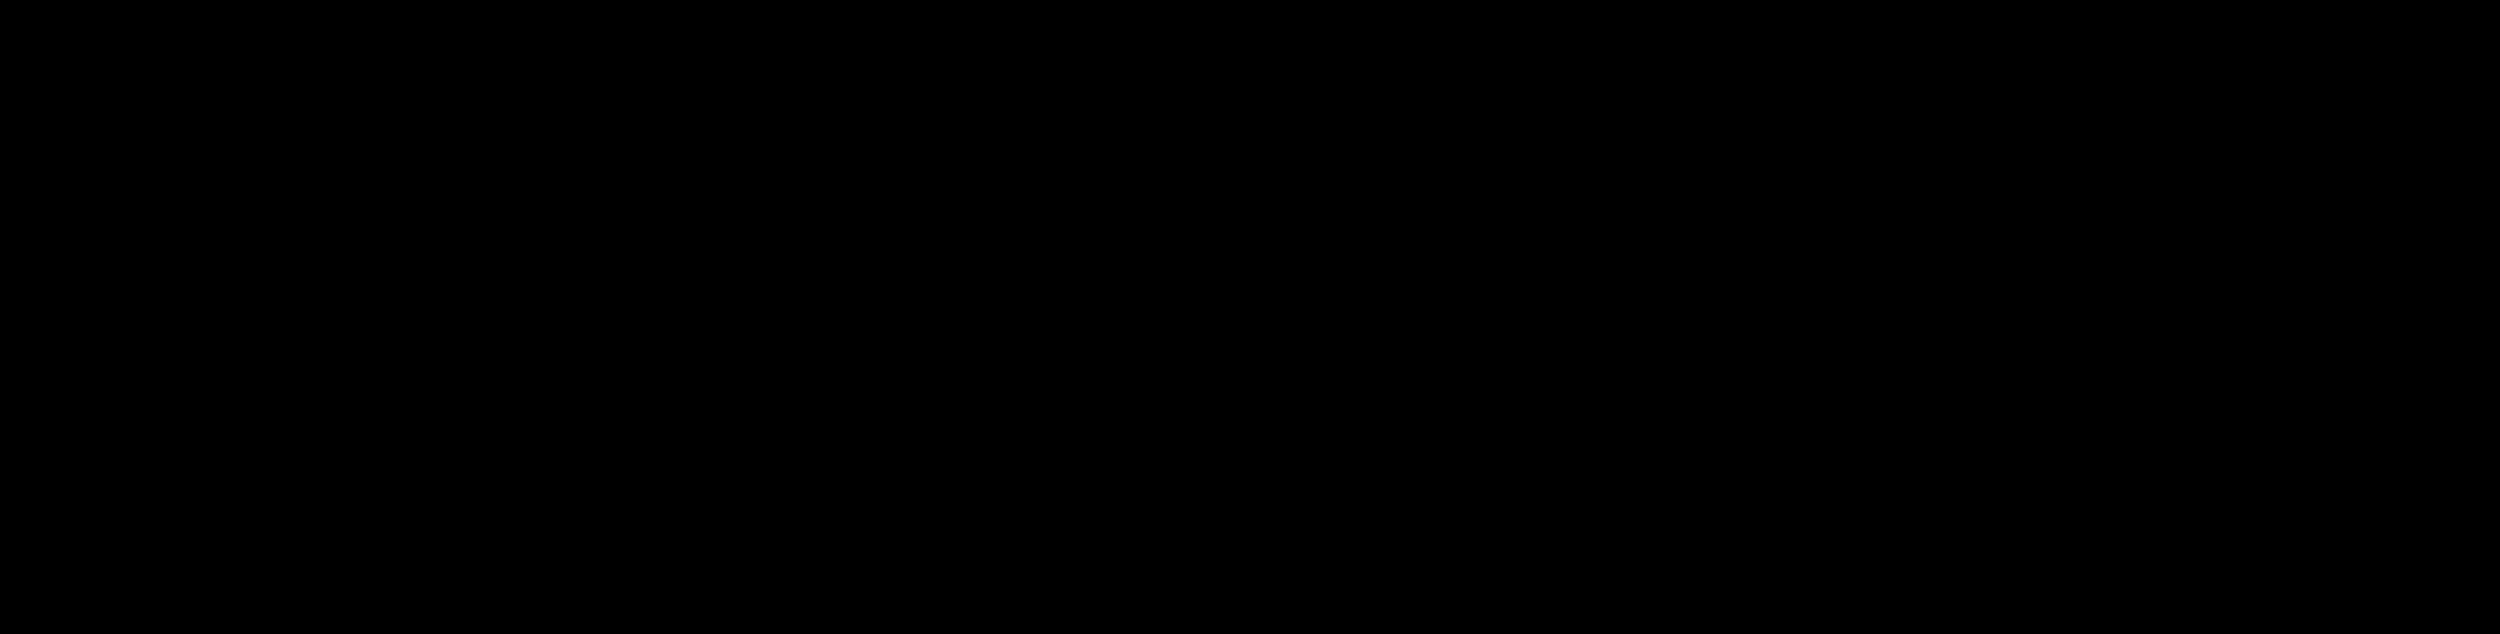 JCMP-Logos-rgb-ƒ-04.png